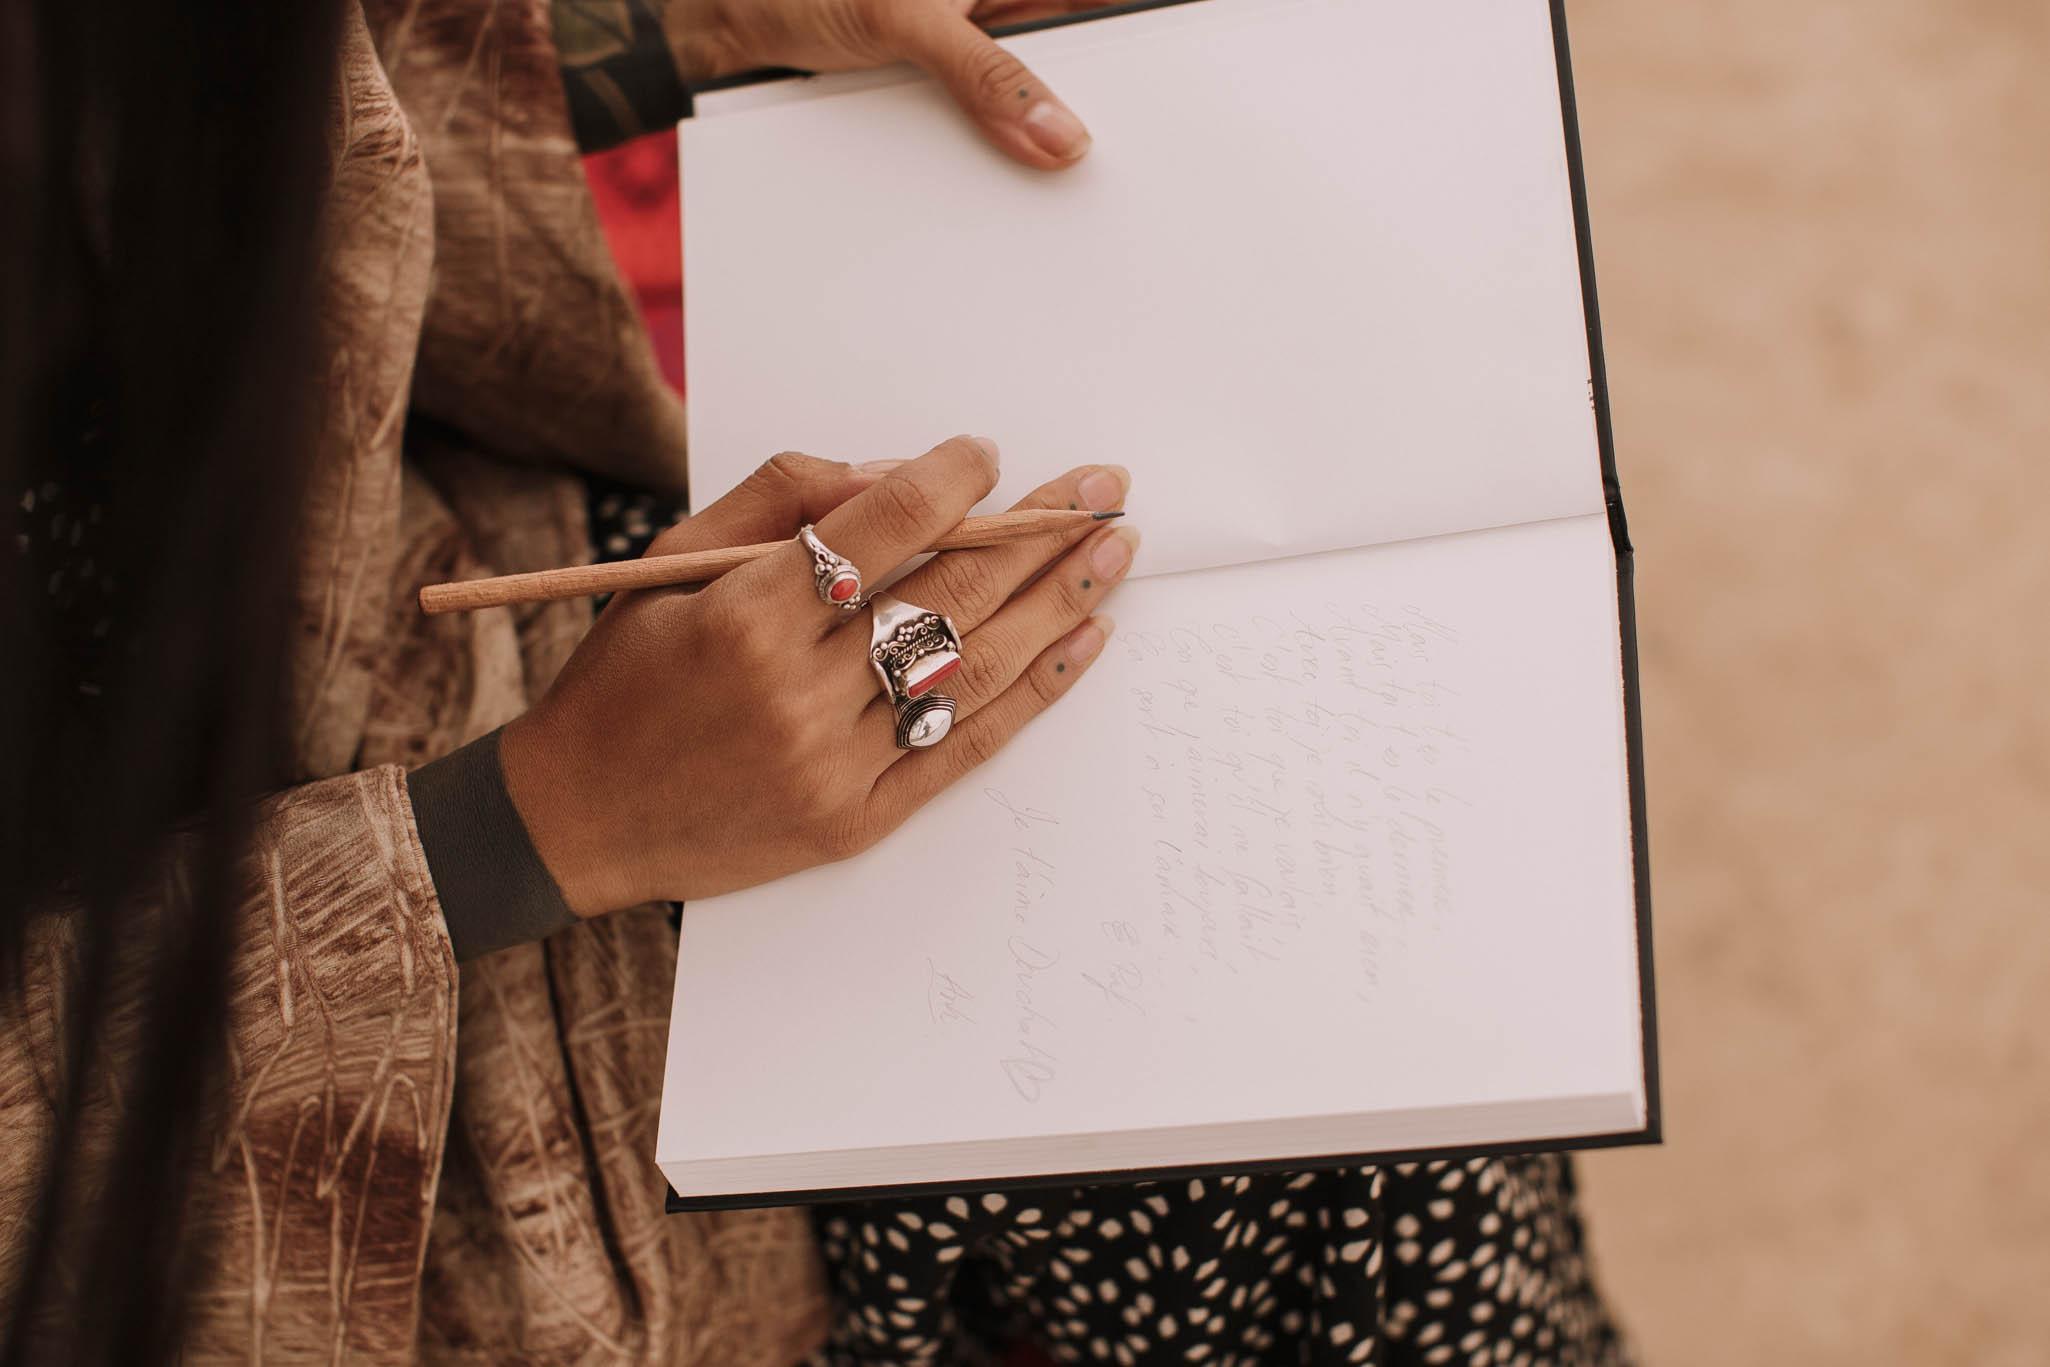 Spain-wedding-photographer-bardenas-reales-jeremy-boyer-photographe-mariage-bordeaux-floral-wedding-dress-robe-48.jpg